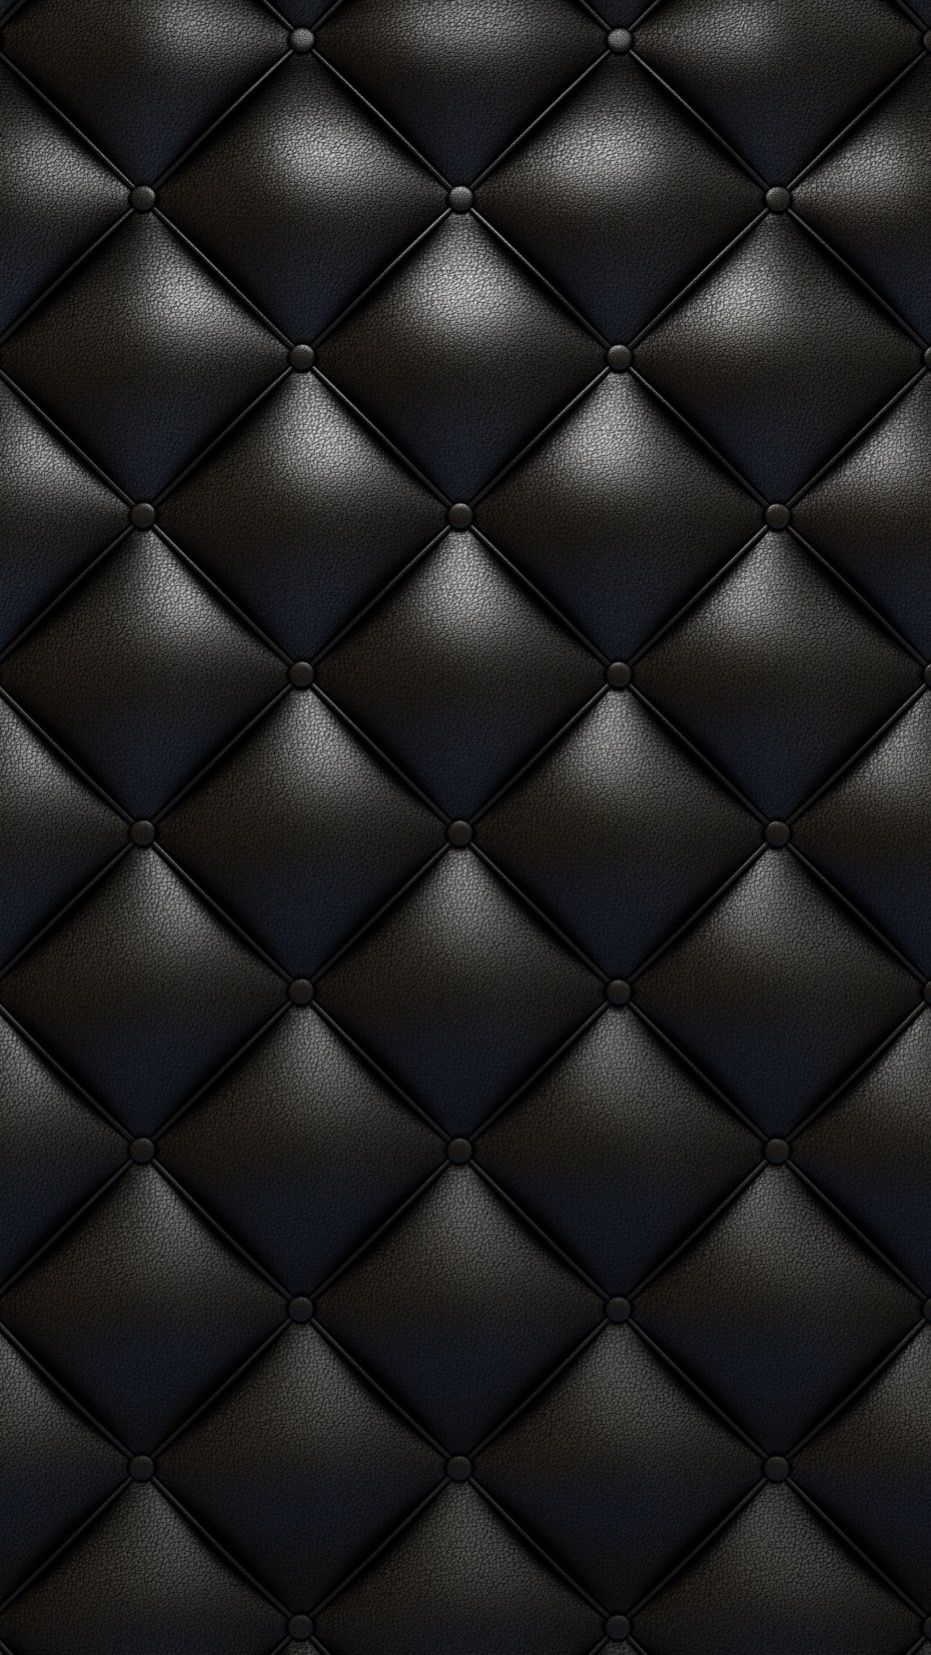 Black Quilted Wallpaper Qนἶℓ৳εɖ • ...